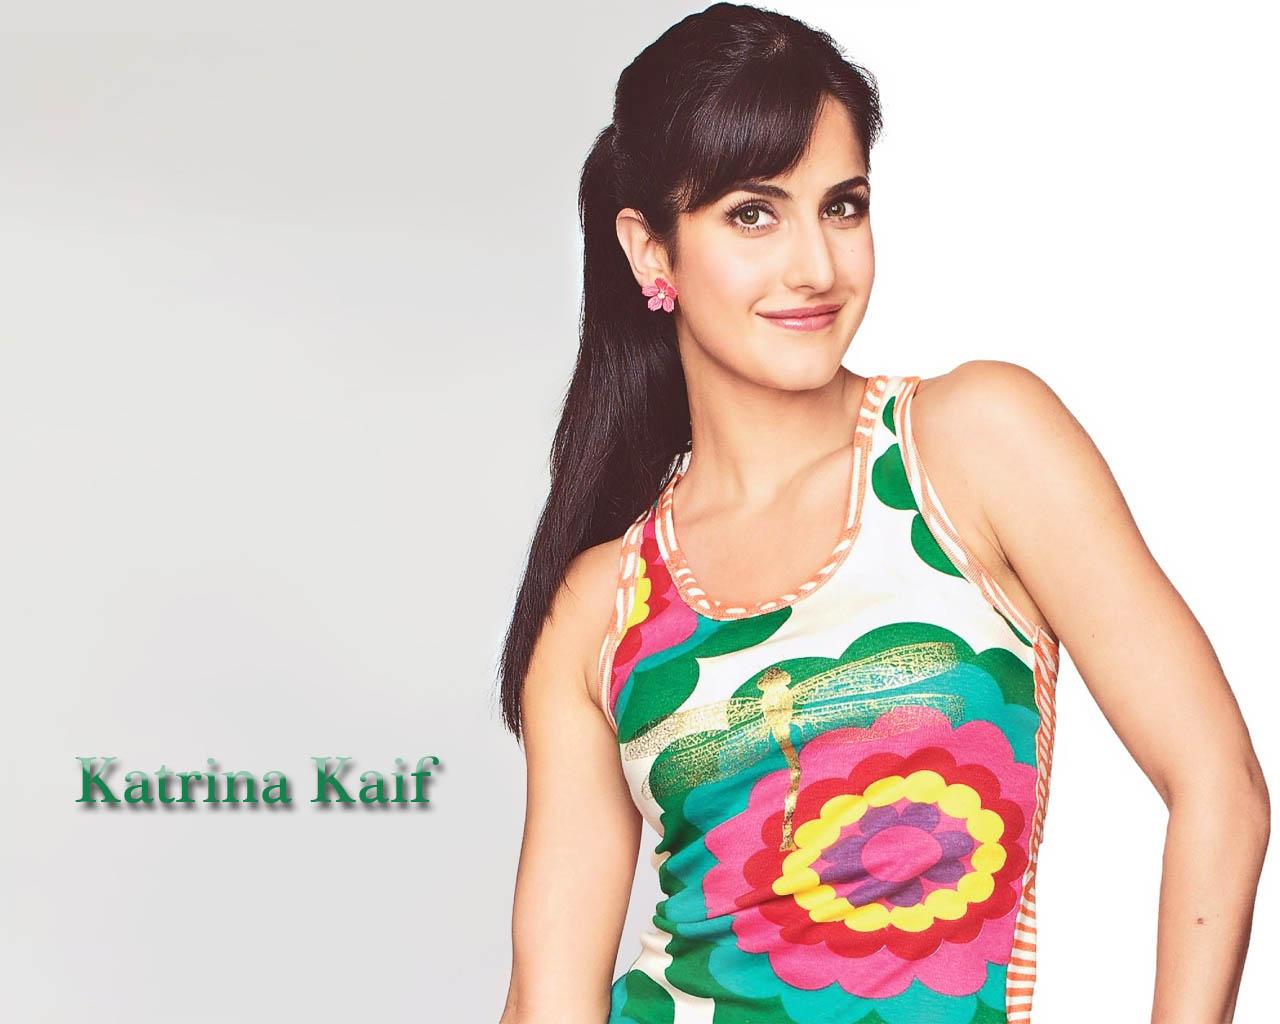 group of download katrina kaif latest